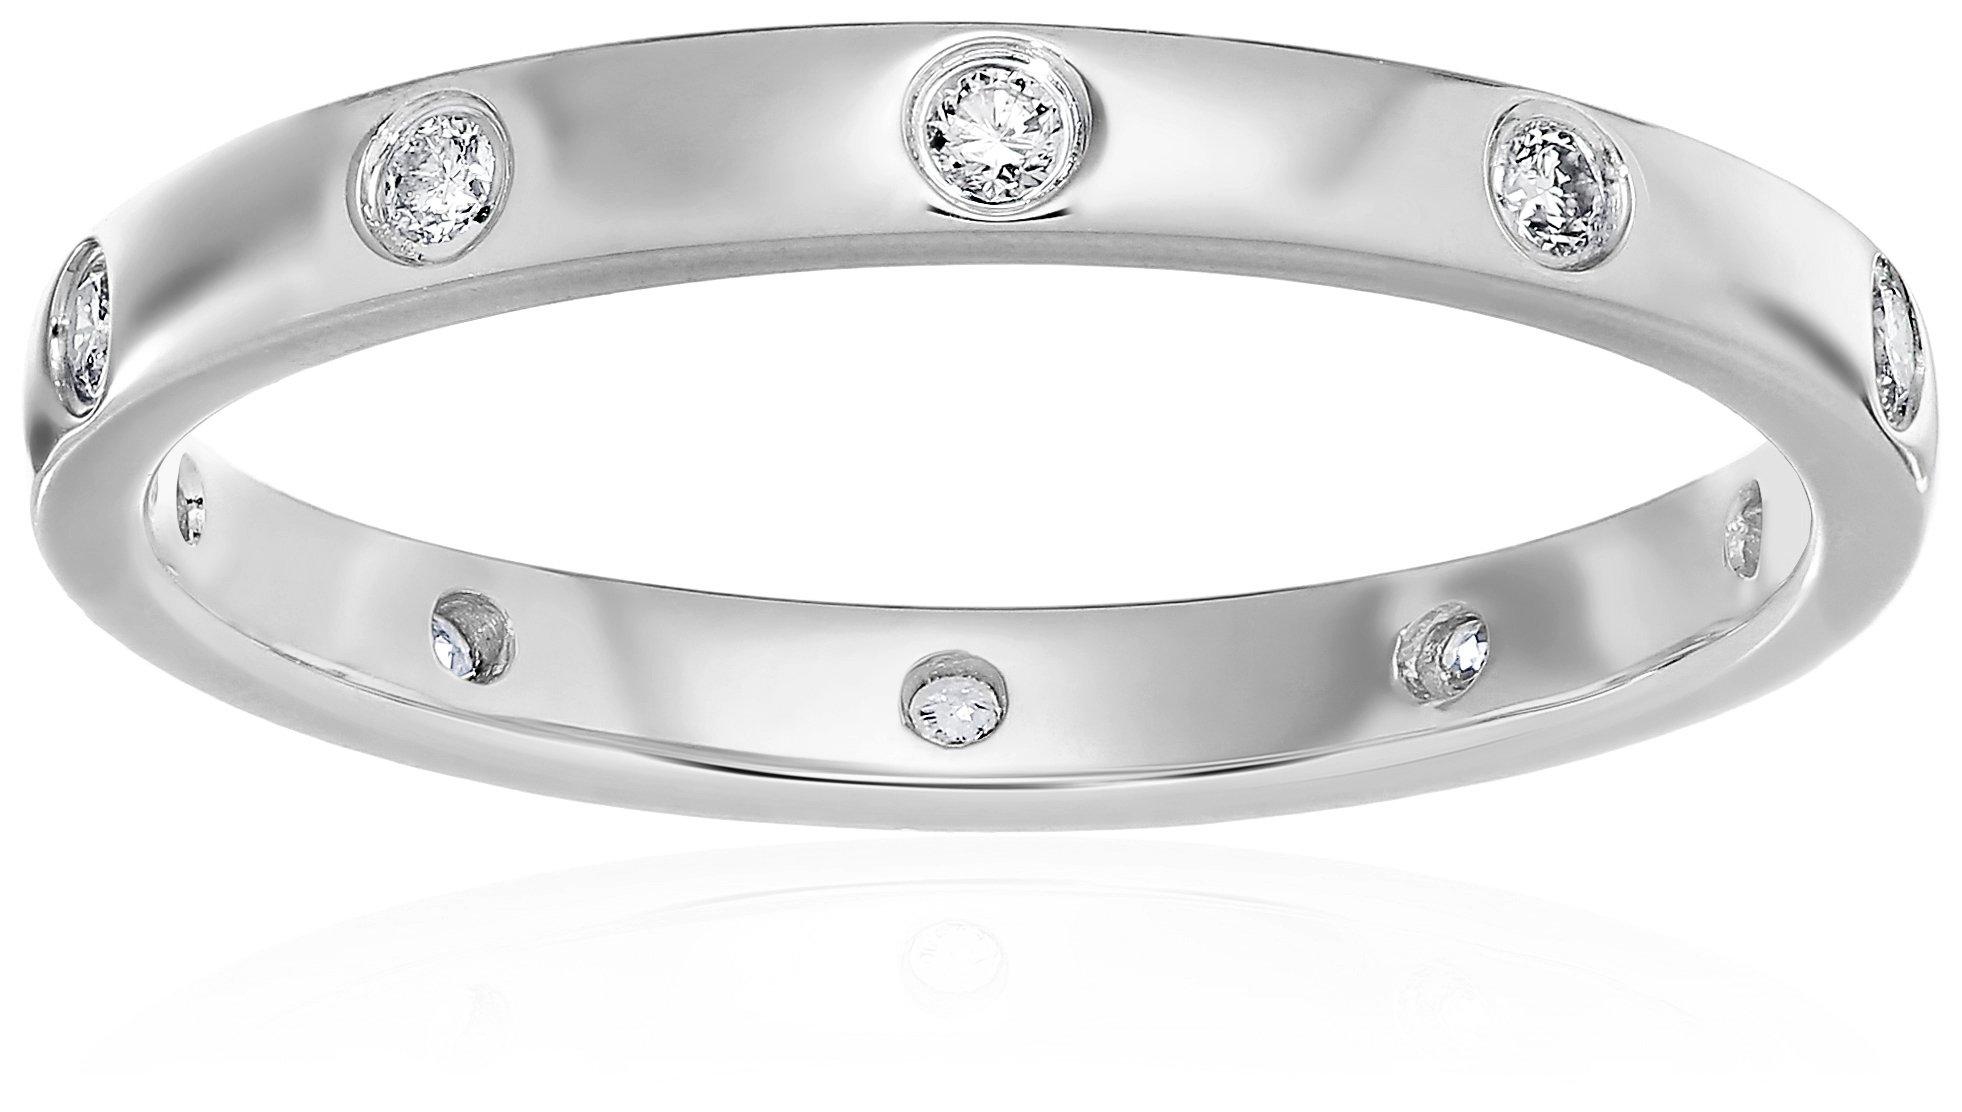 10k White Gold Eternity Diamond Eternity Ring, Size 7